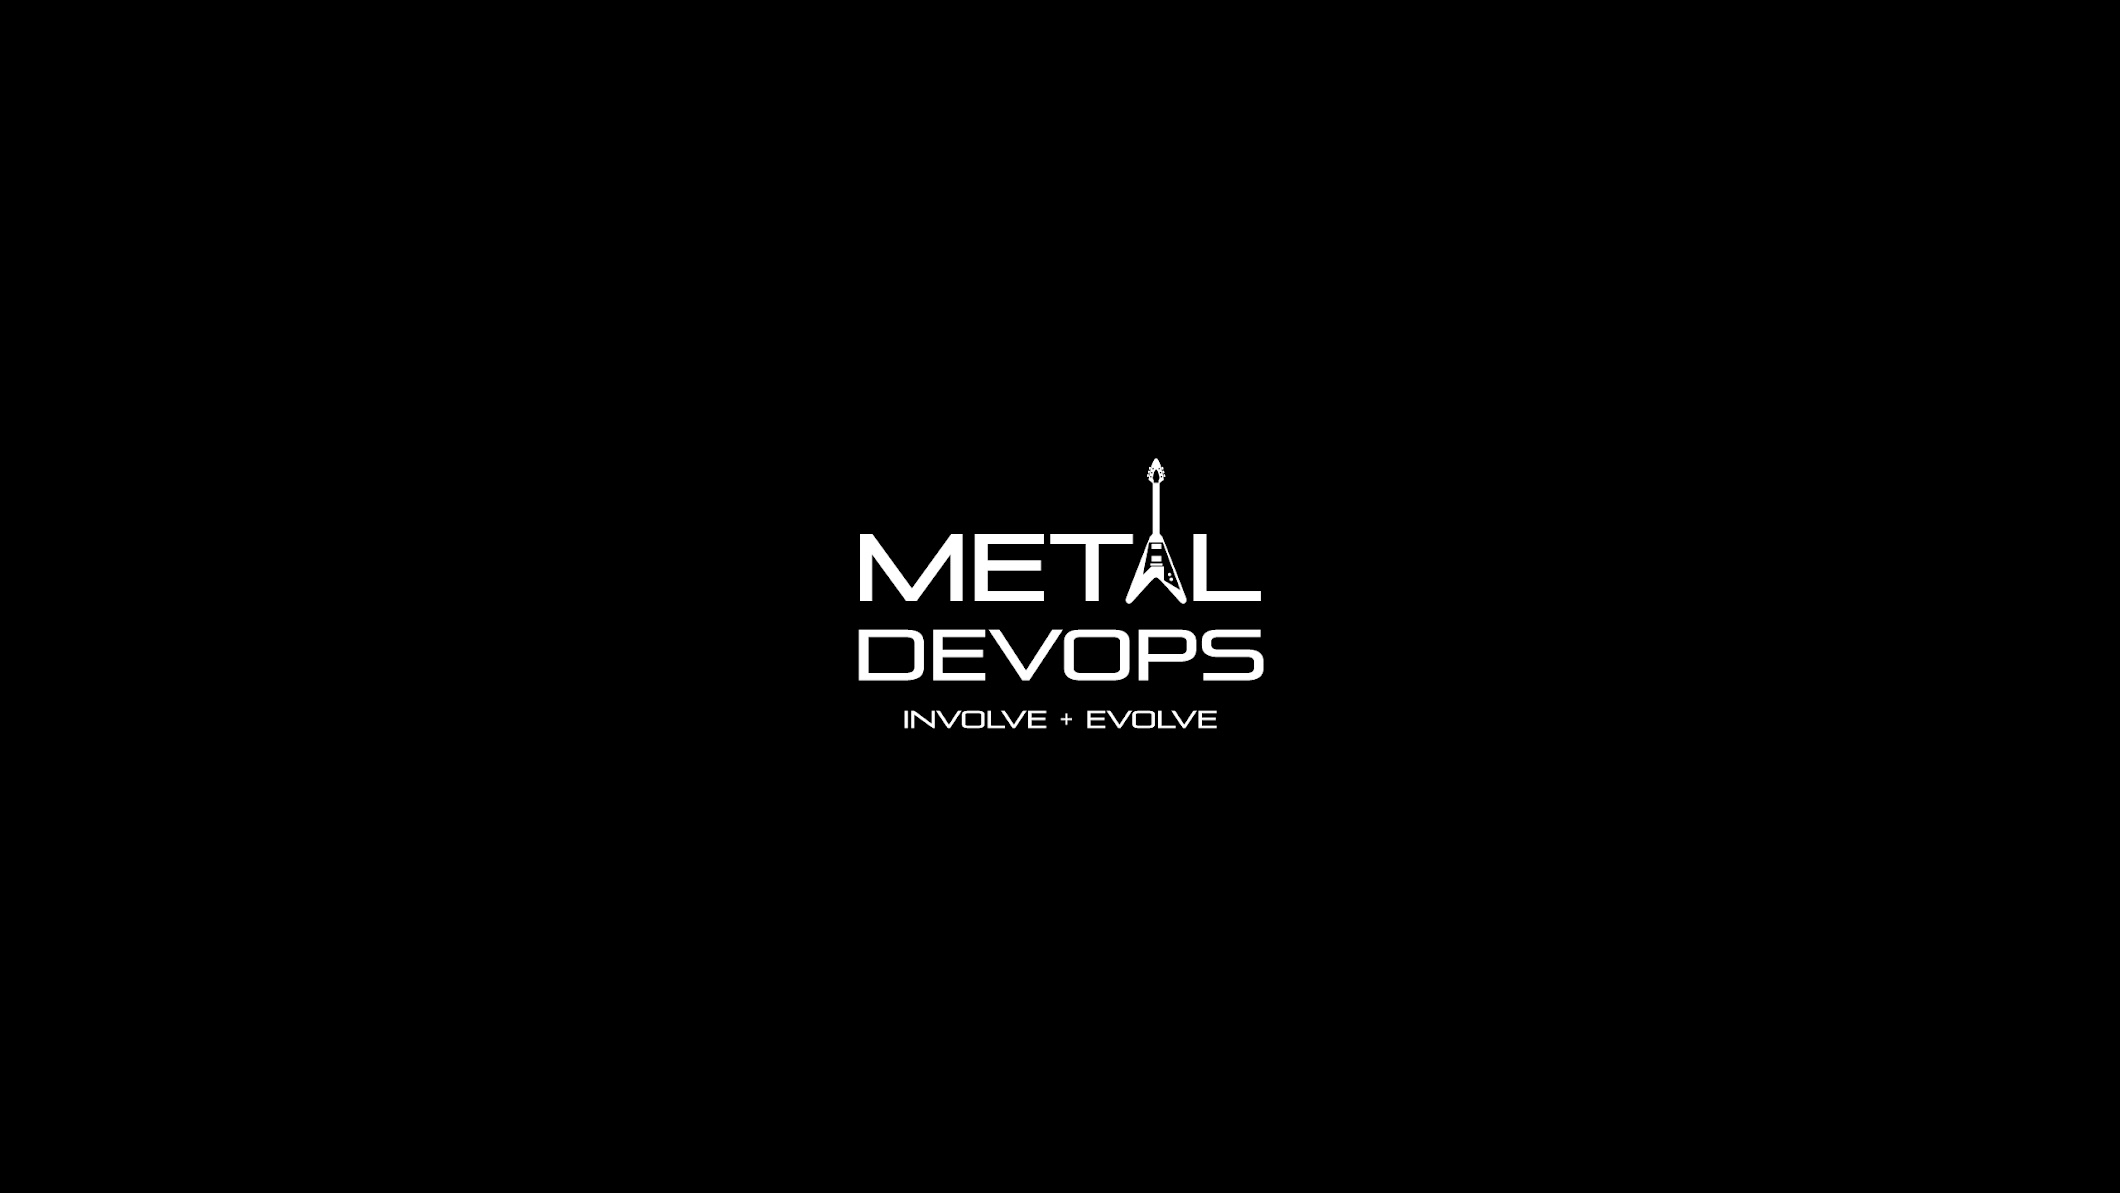 MetalDevOps